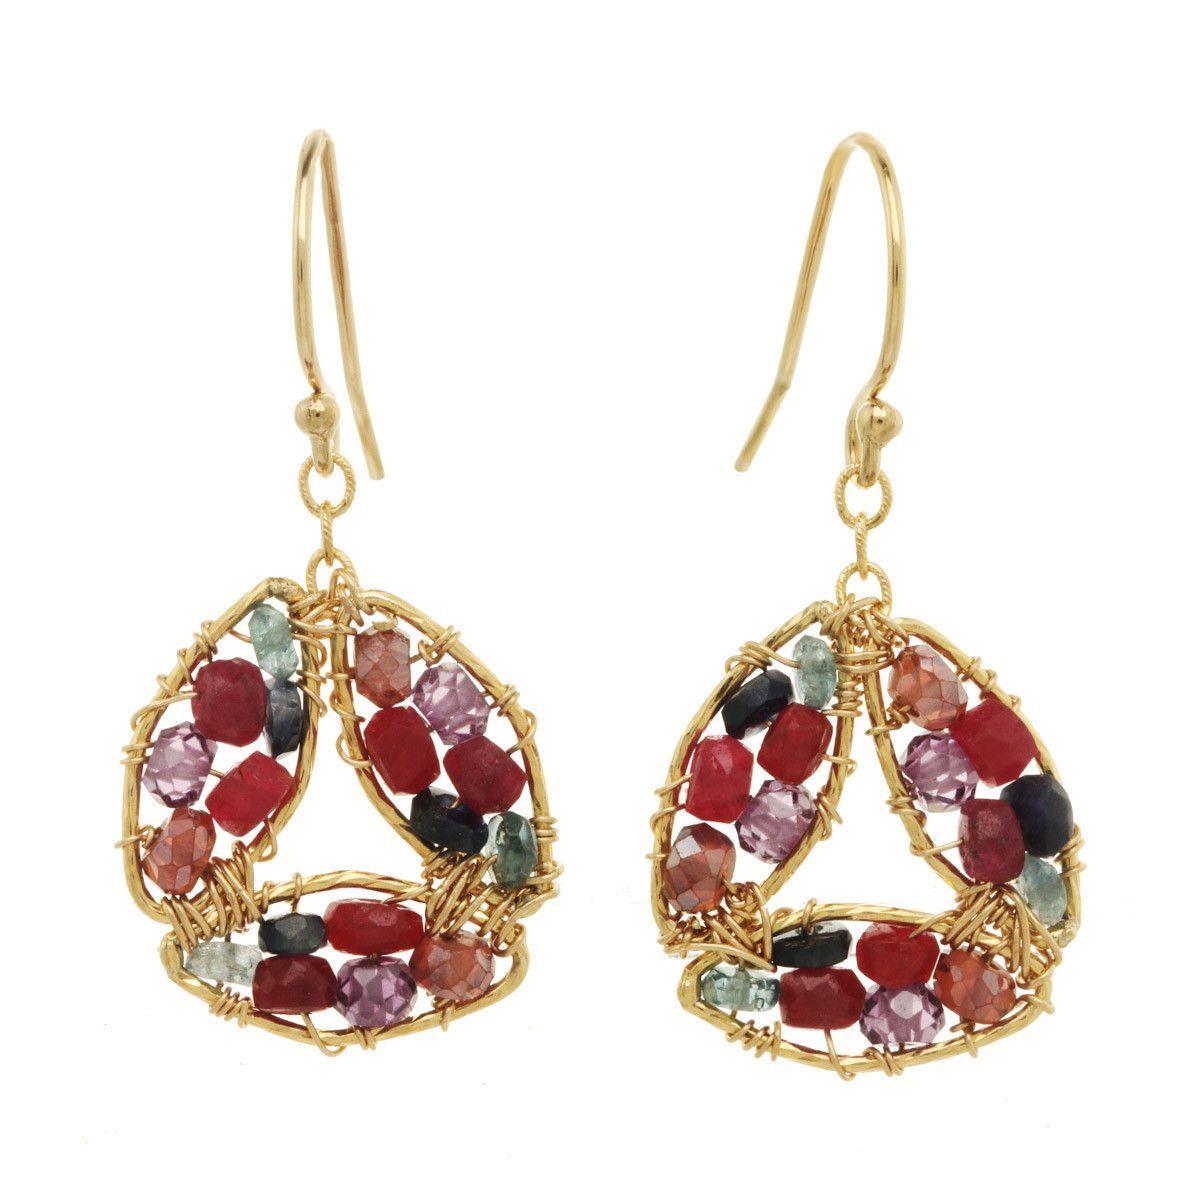 Michelle Pressler Earrings Amethyst and Ruby 2846 Artistic